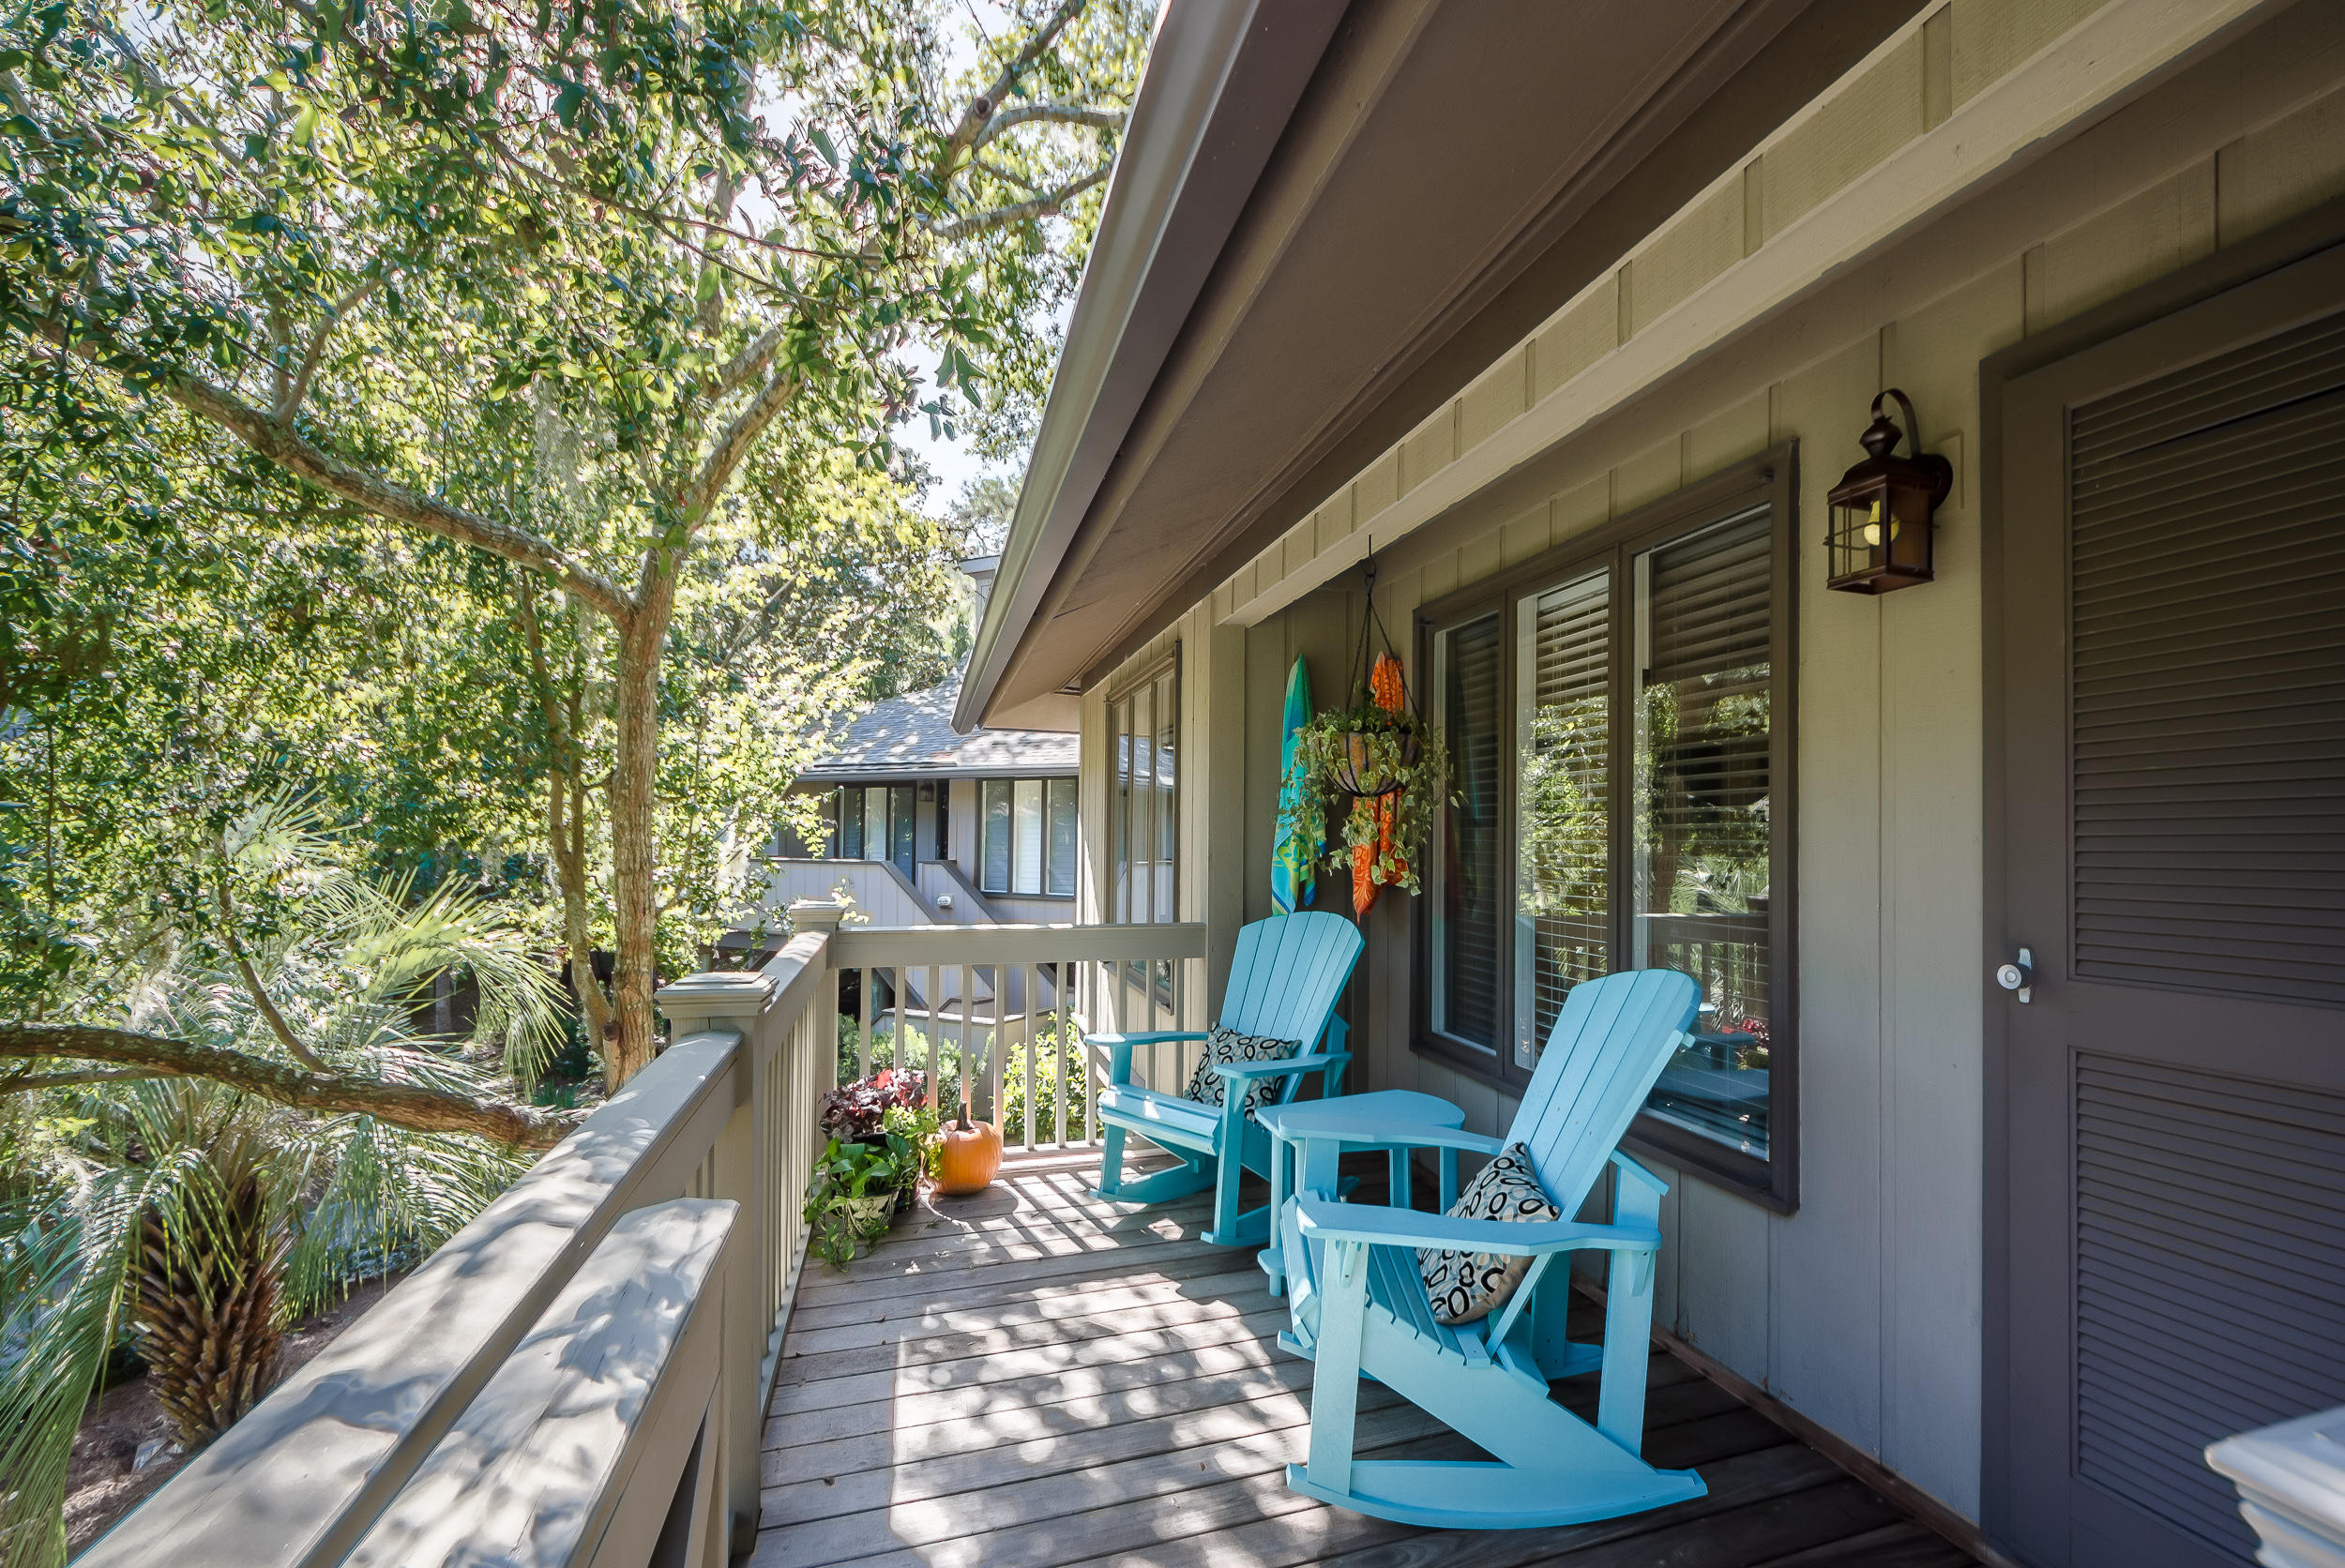 Kiawah Island Homes For Sale - 4186 Bald Pate, Kiawah Island, SC - 16